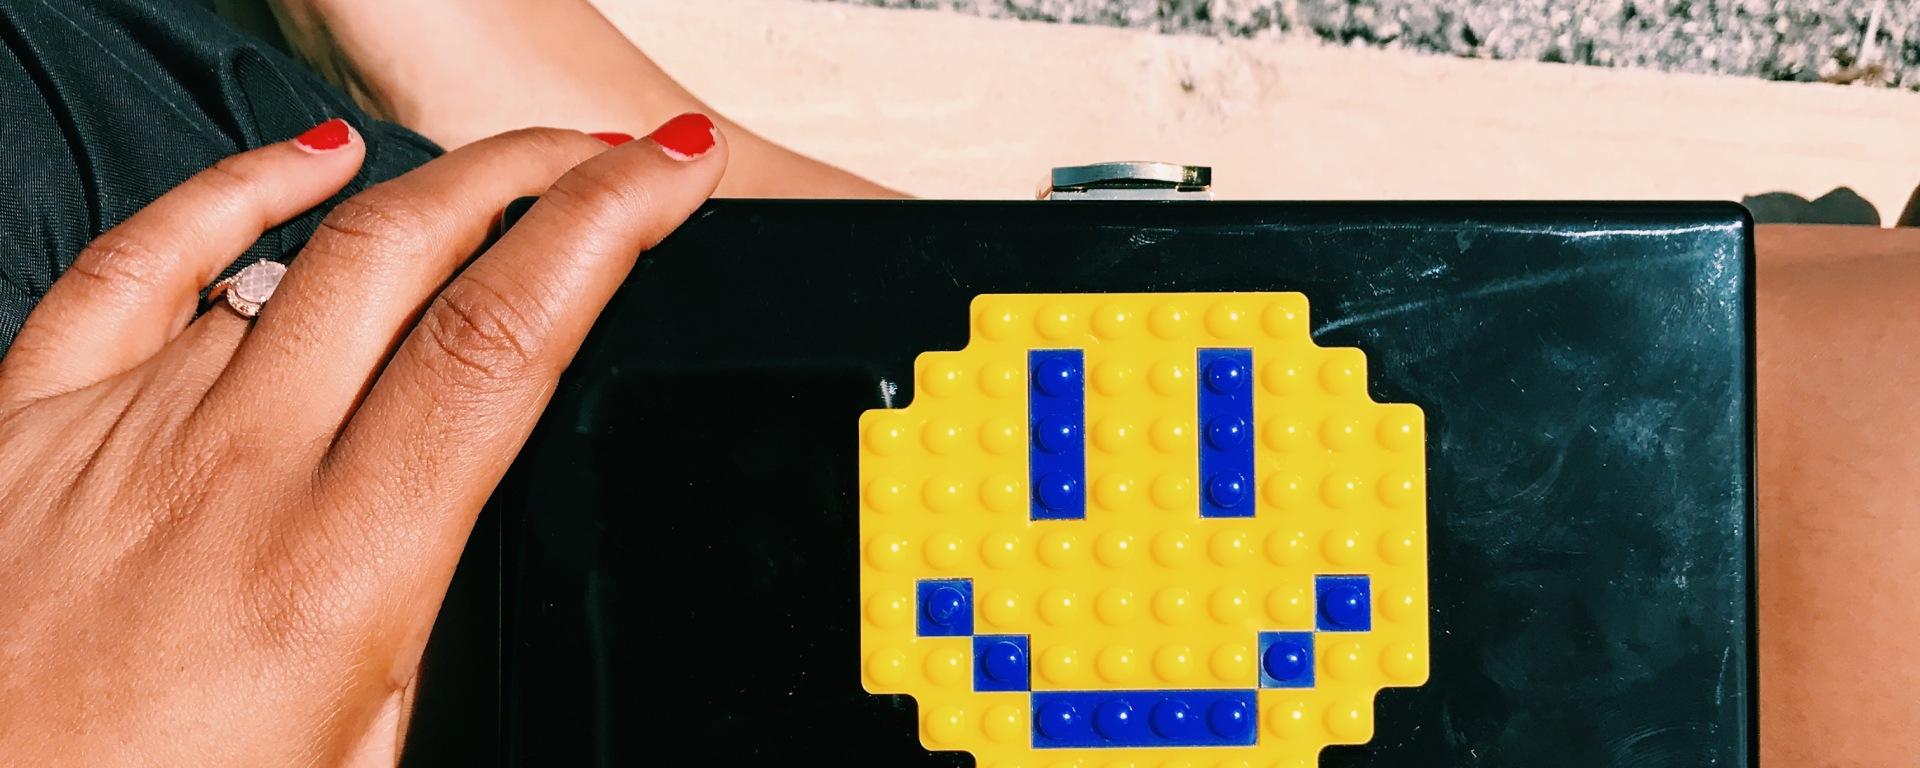 black clutch bag with smiley face blue labels boutique